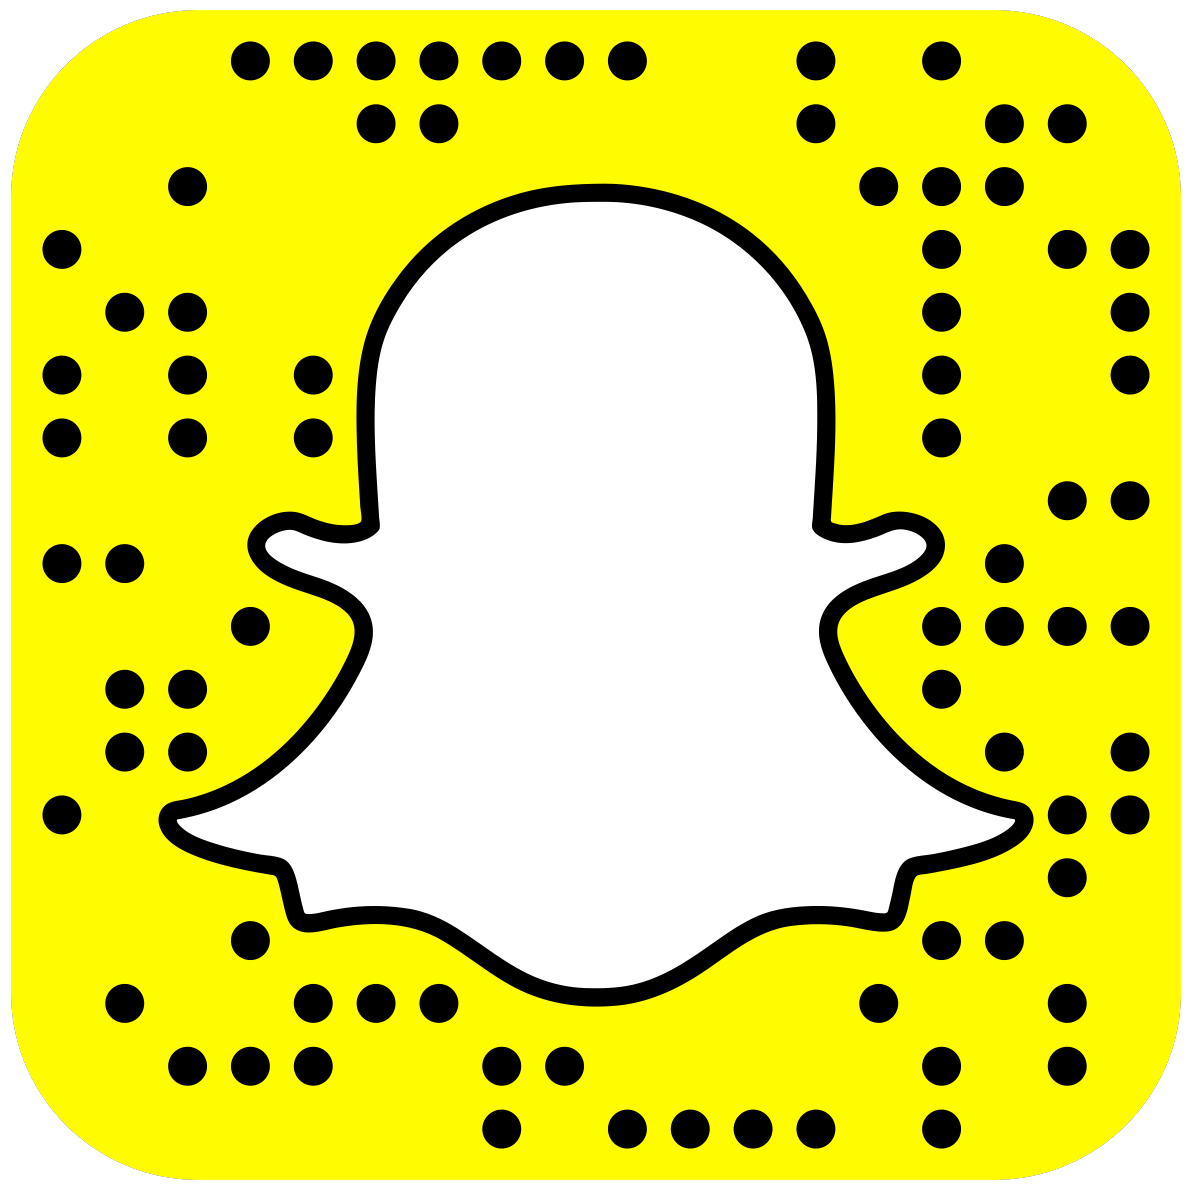 Skai Jackson Snapchat username